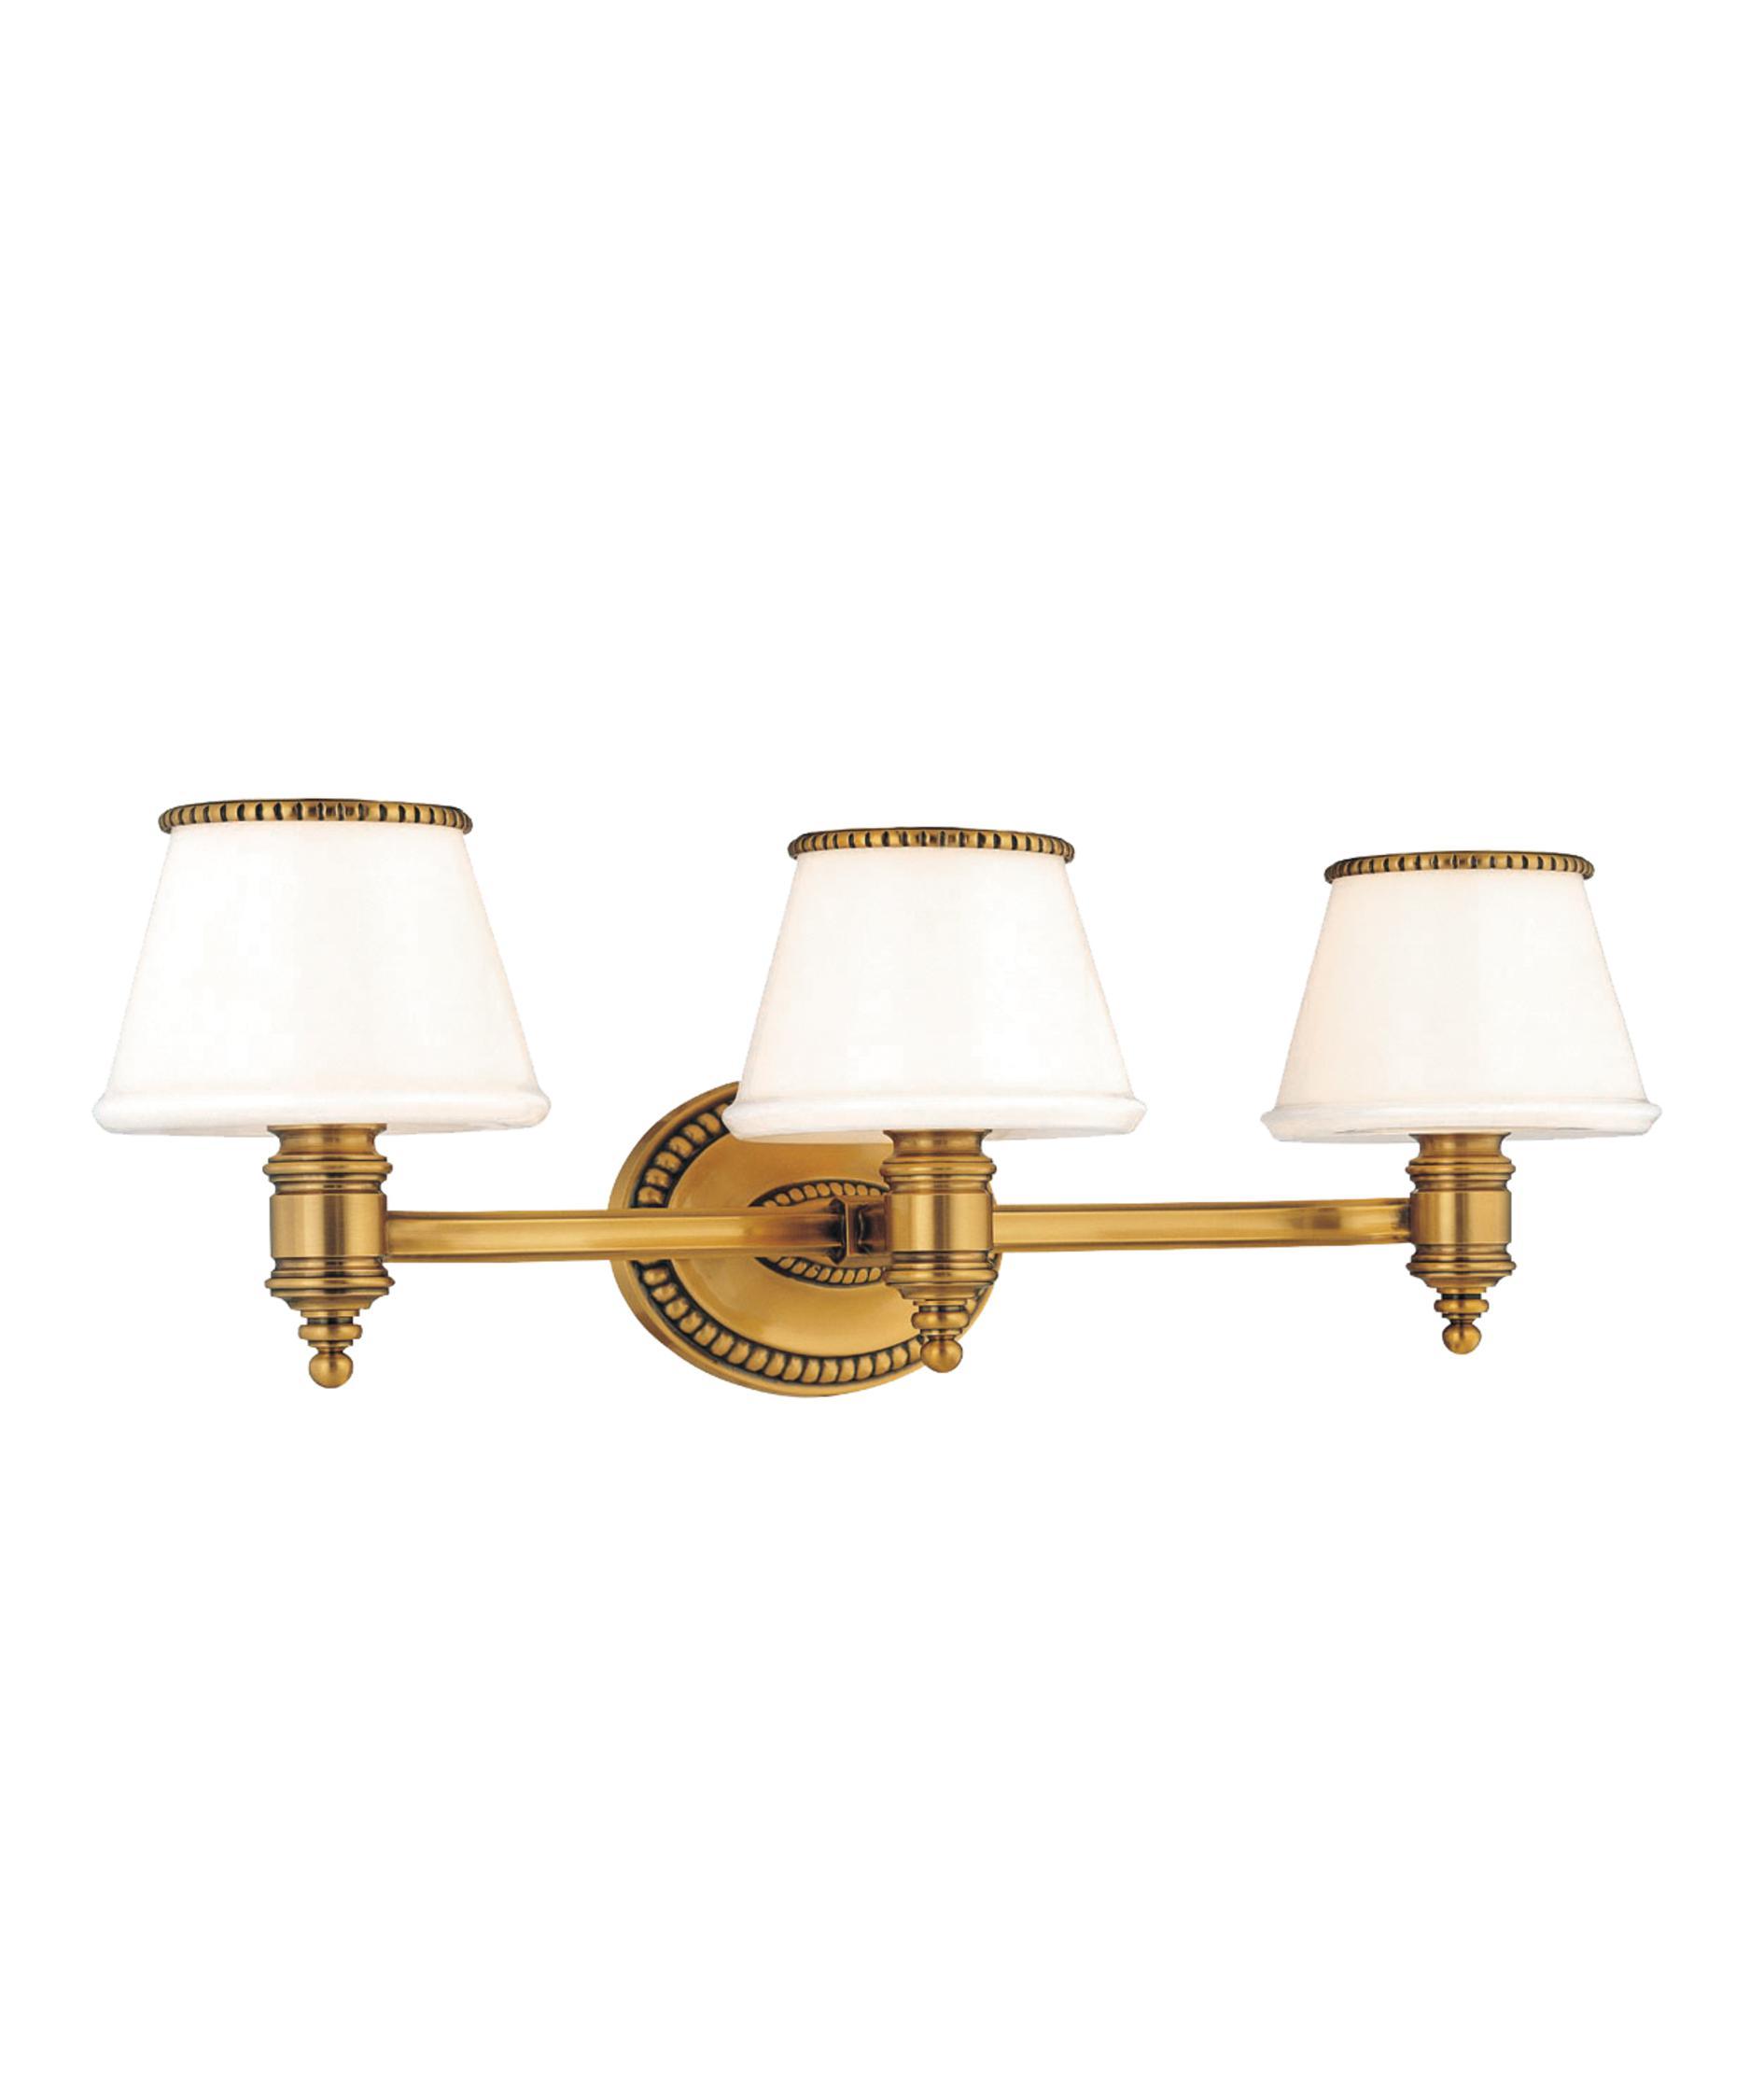 Hudson Valley 4943 Richmond 24 Inch Wide Bath Vanity Light